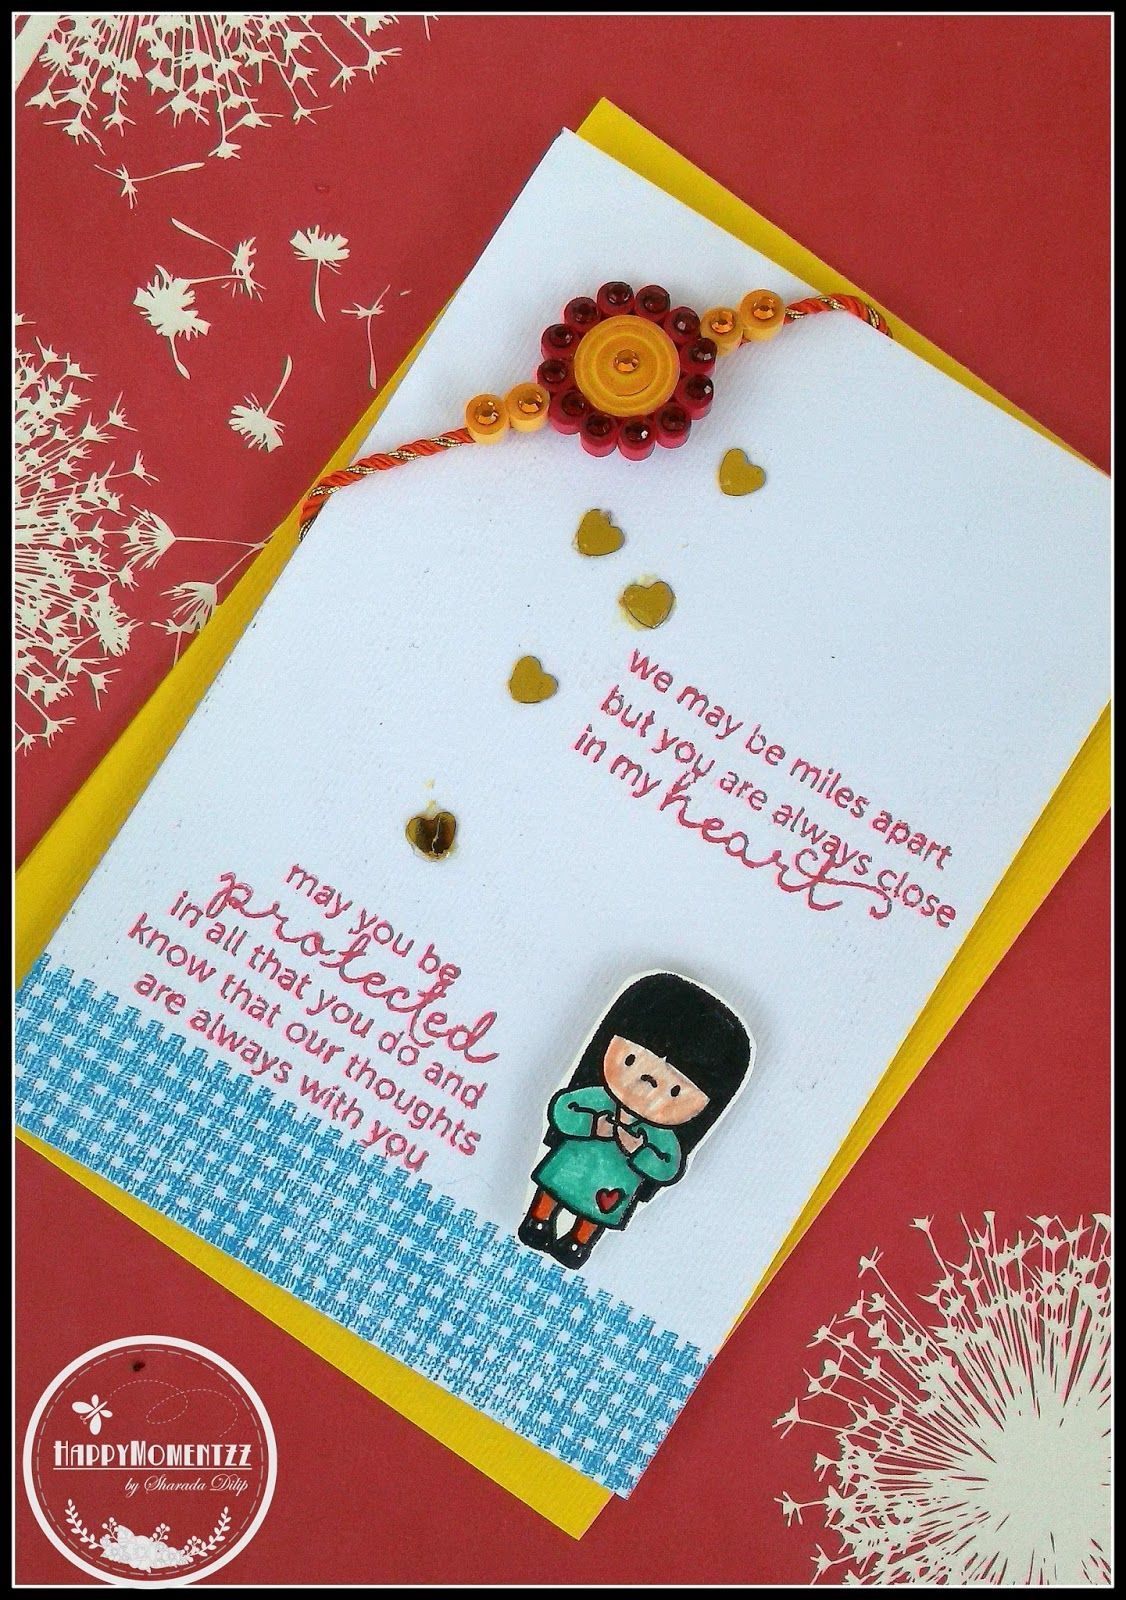 Pinshikha Chamaria On Rakhi Cards | Rakhi Cards, Handmade Rakhi - Free Online Printable Rakhi Cards